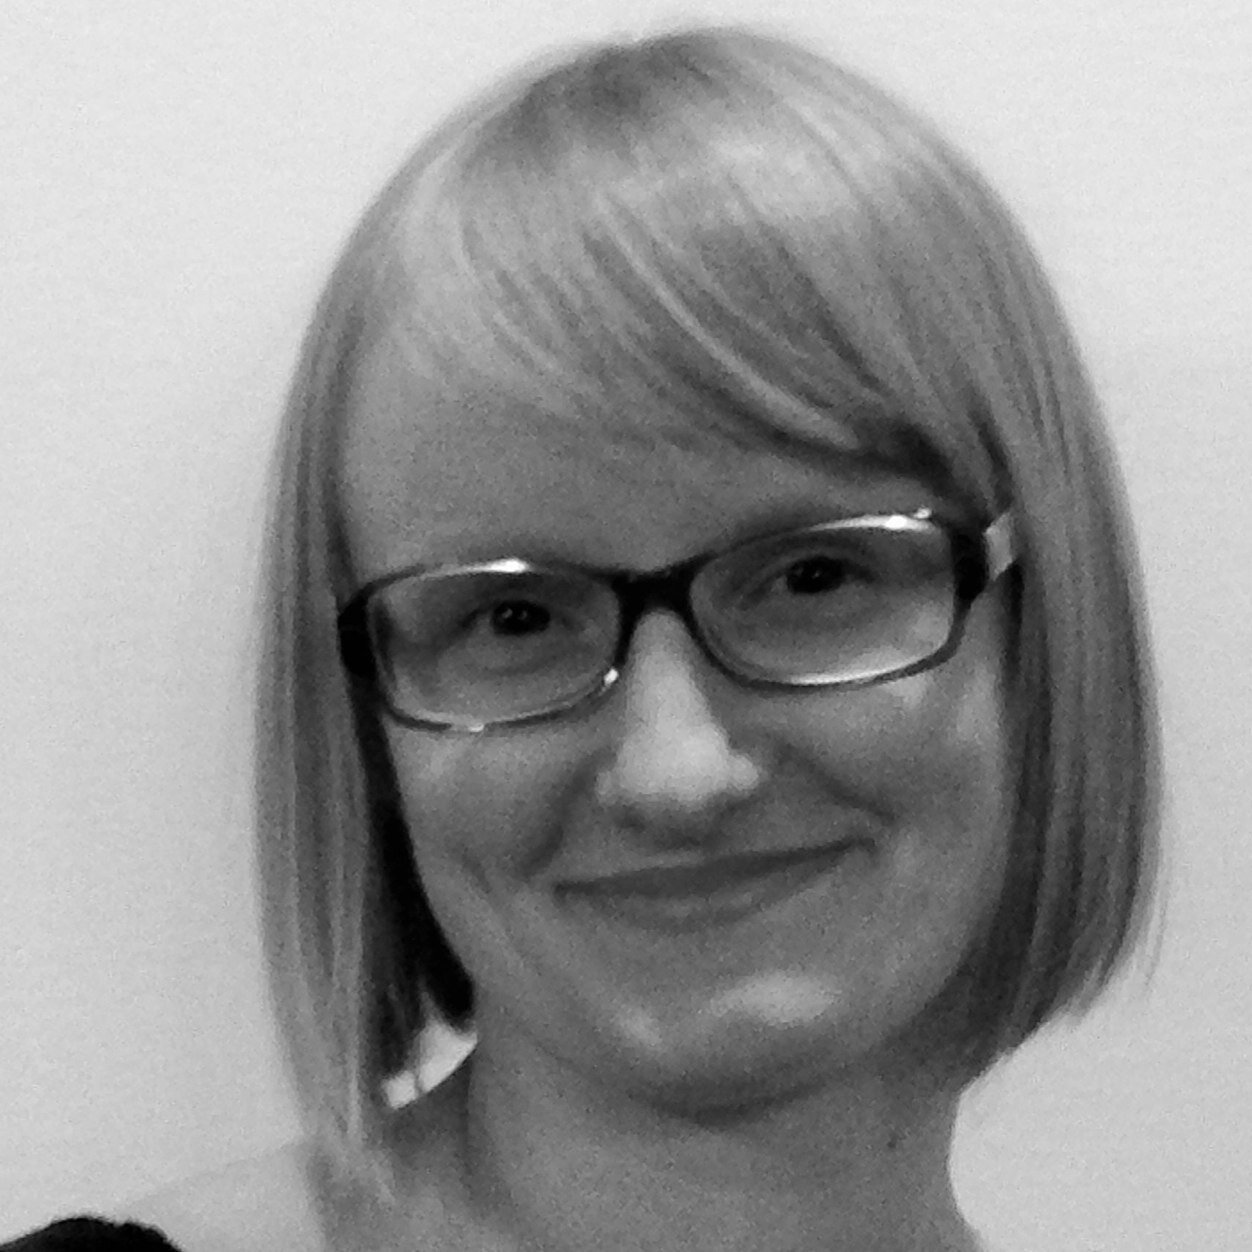 rachel harland on twitter inspiring post on academic portfolio rachel harland